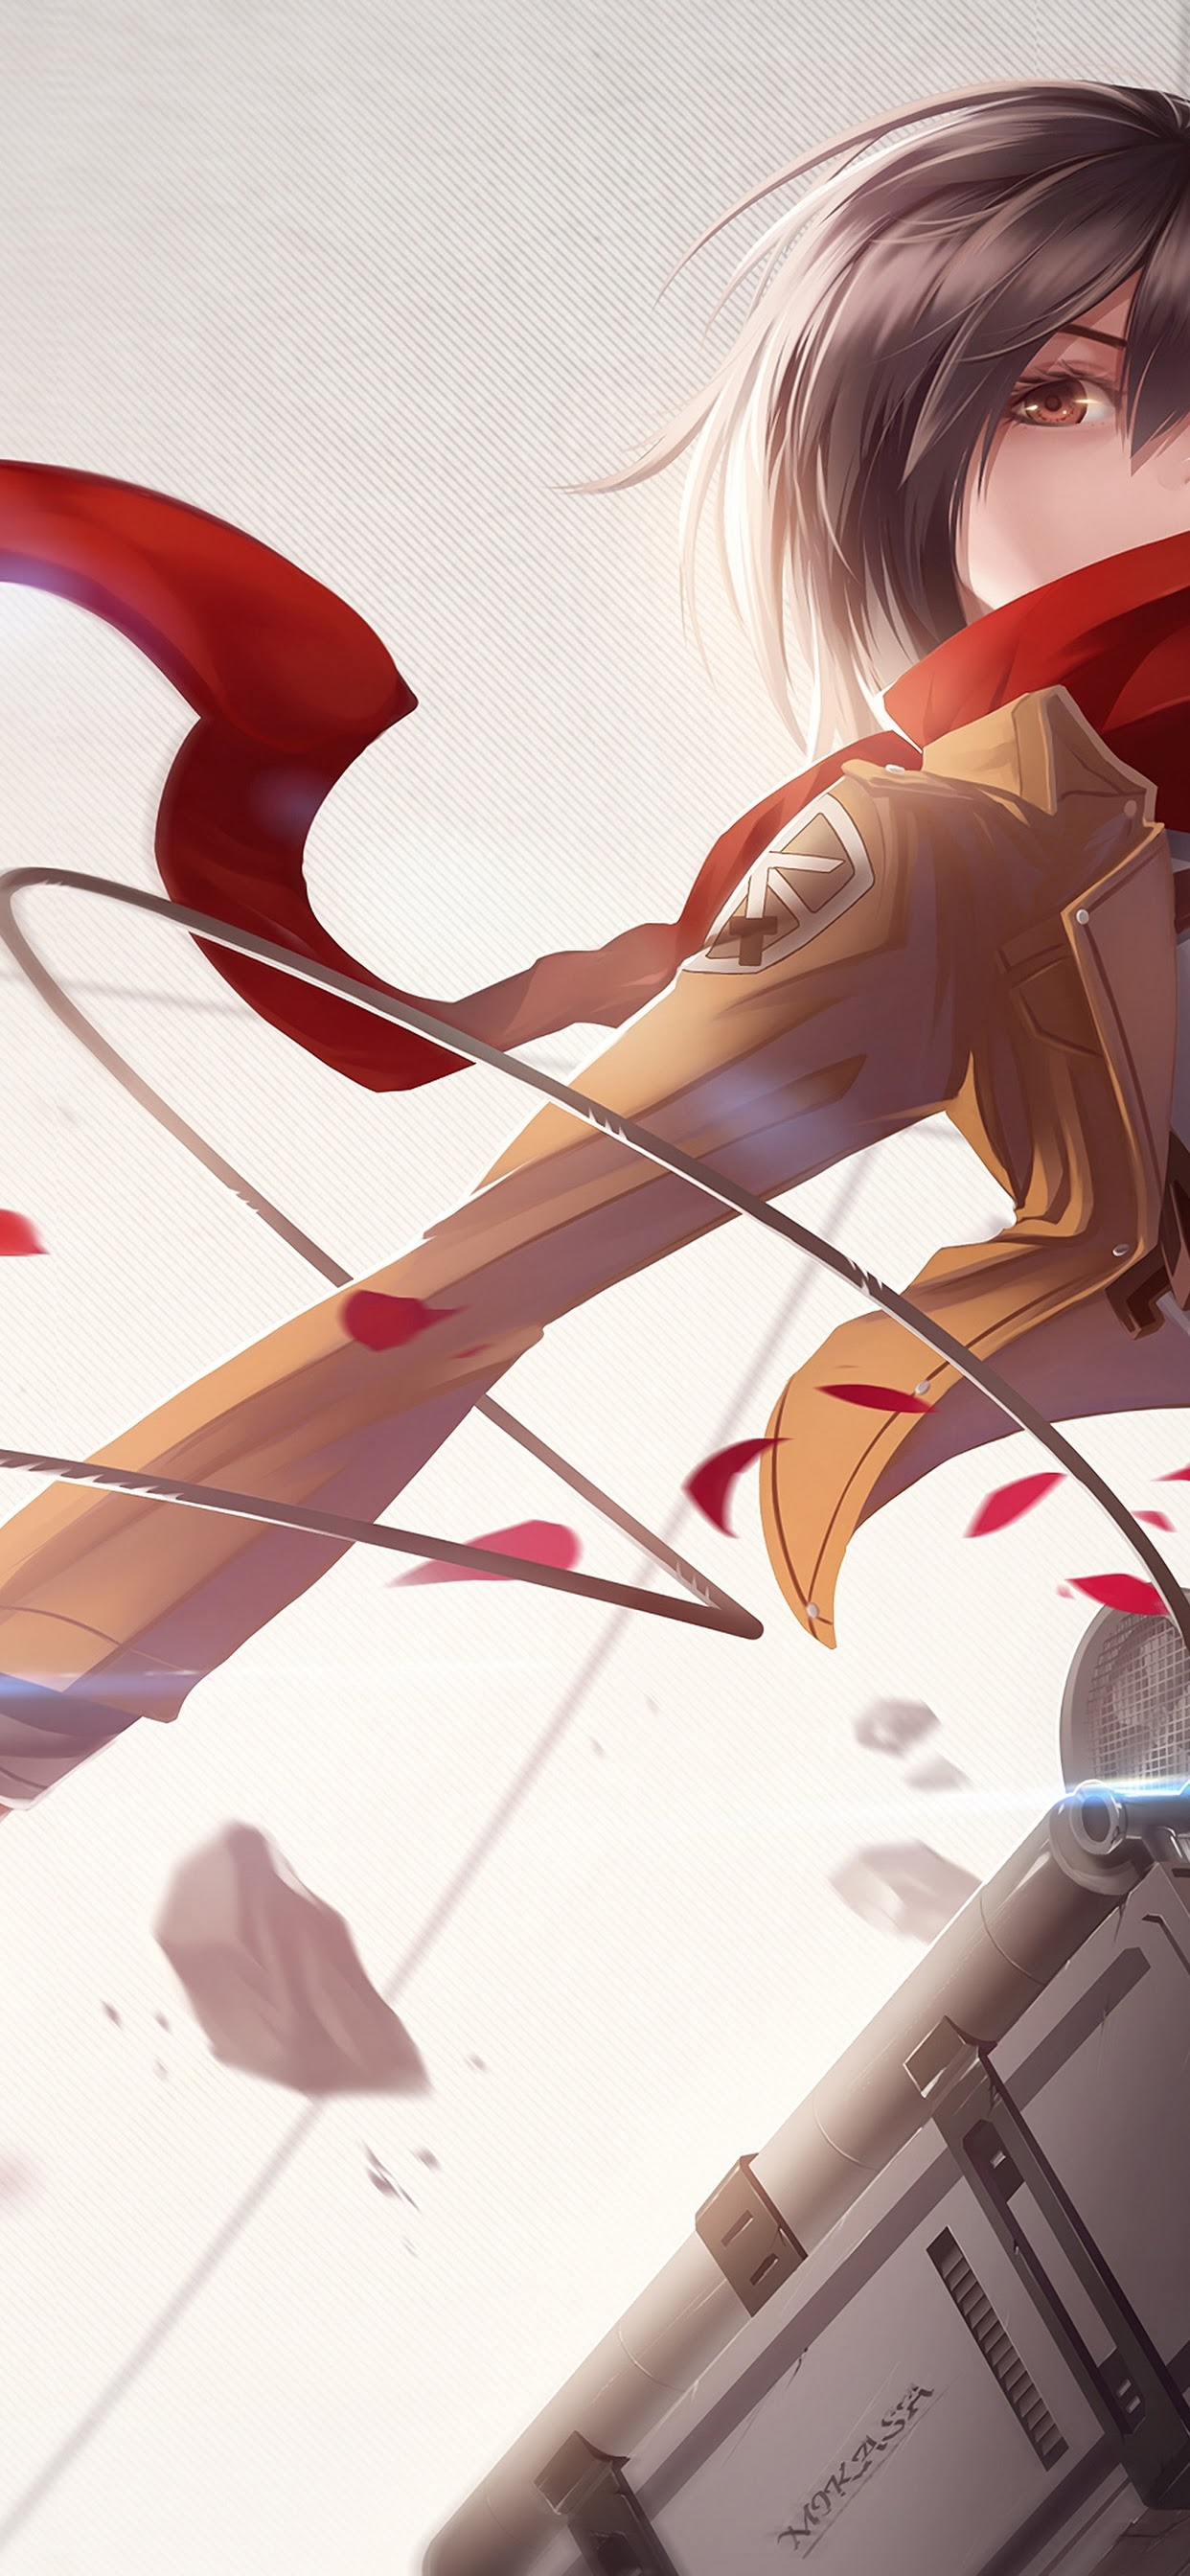 Mikasa Attack On Titan 4k Wallpaper 89